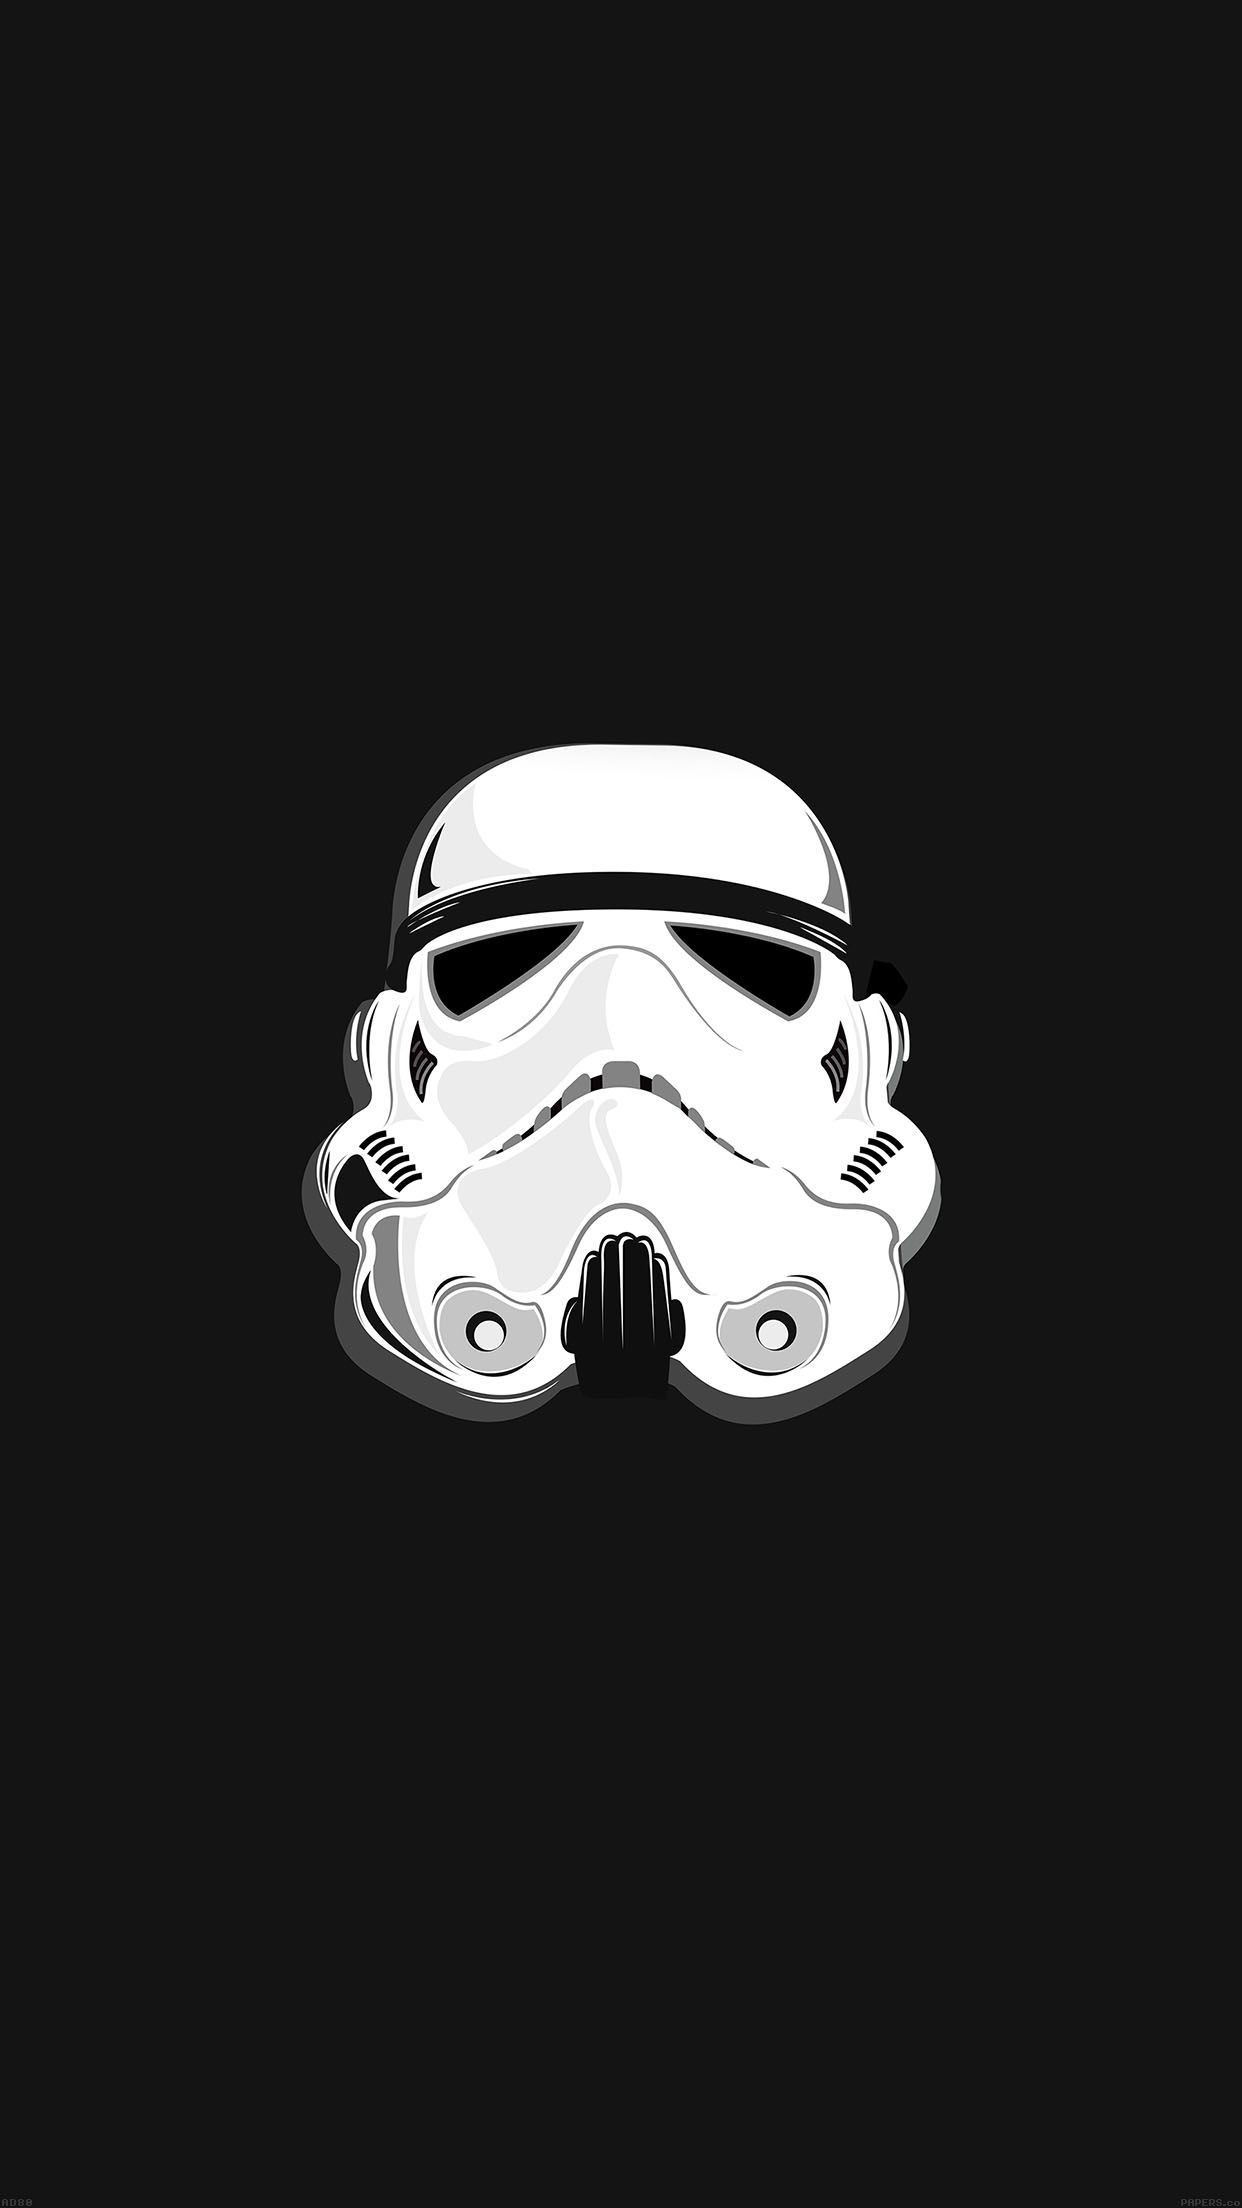 Widescreen Wallpapers of Star Wars, Top Wallpapers. 0.062 MB